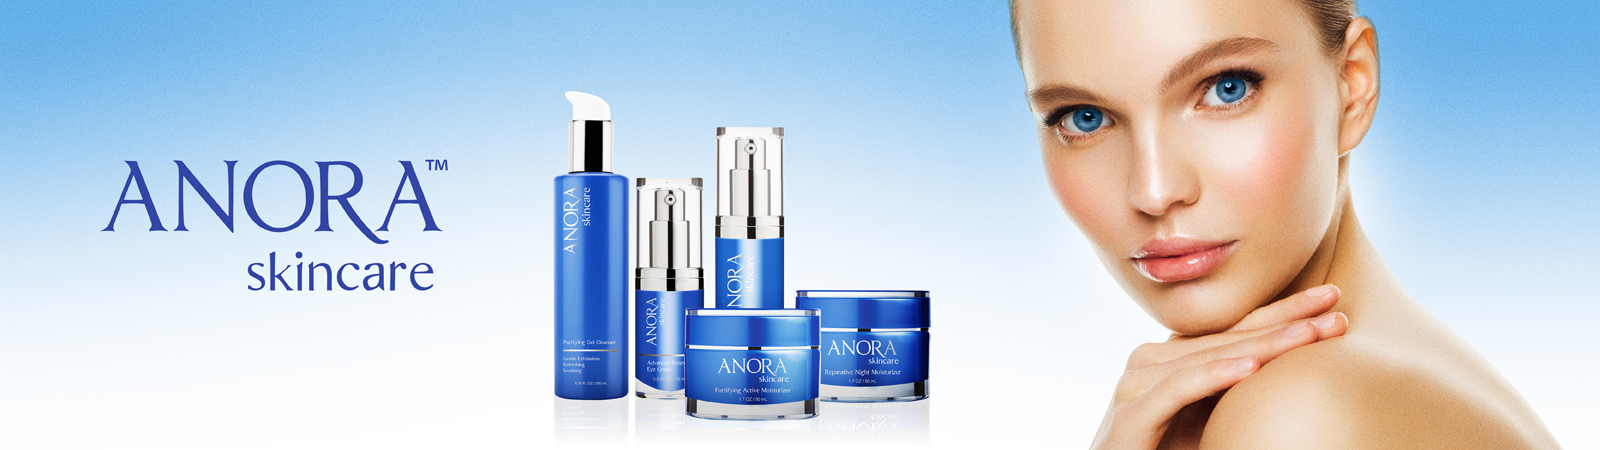 Anora-Skincare-at-BeautifiedYou.jpg